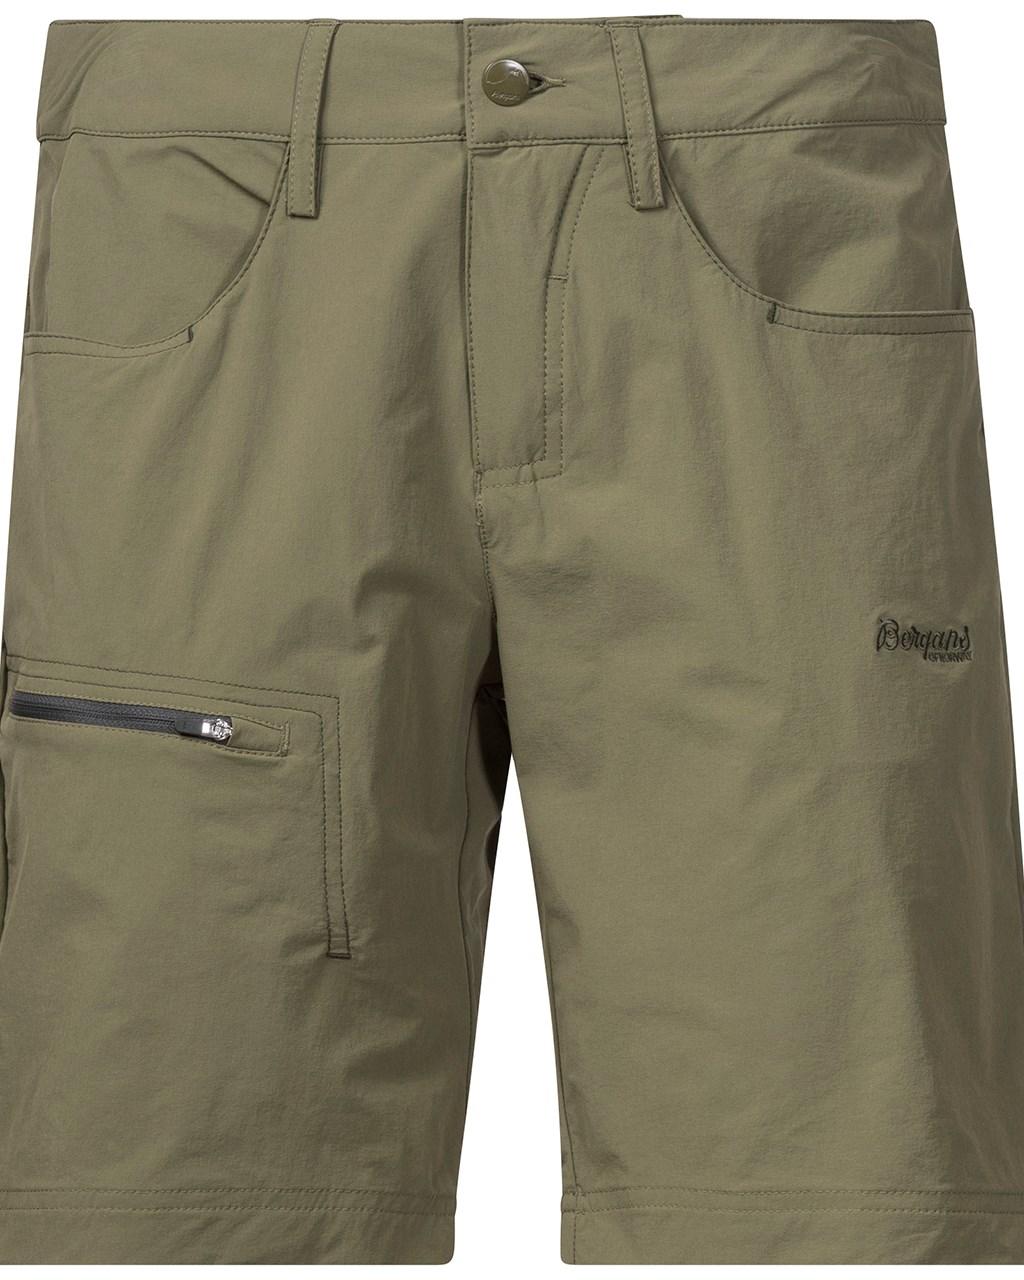 9f9c0837 Moa Lady Shorts Khaki Green/Seaweed